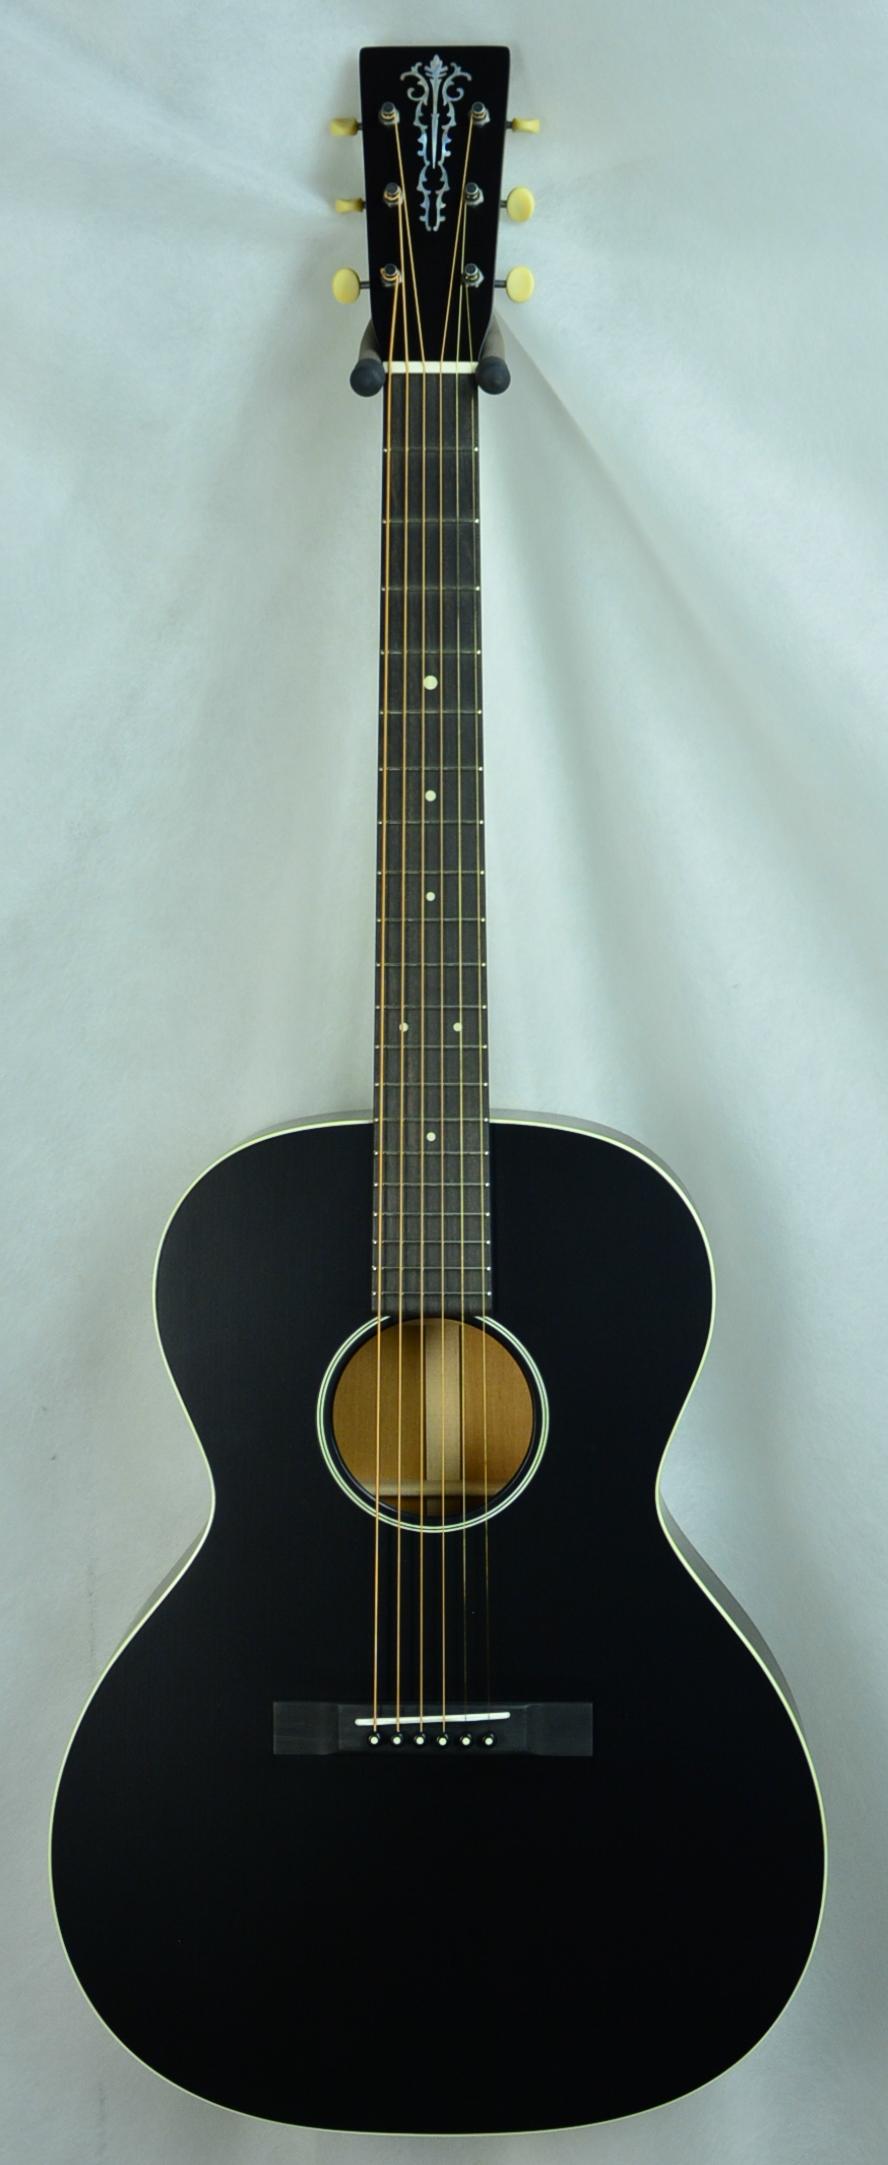 Q-2563924 S-1900906 CEO7 Flat Black (1).JPG